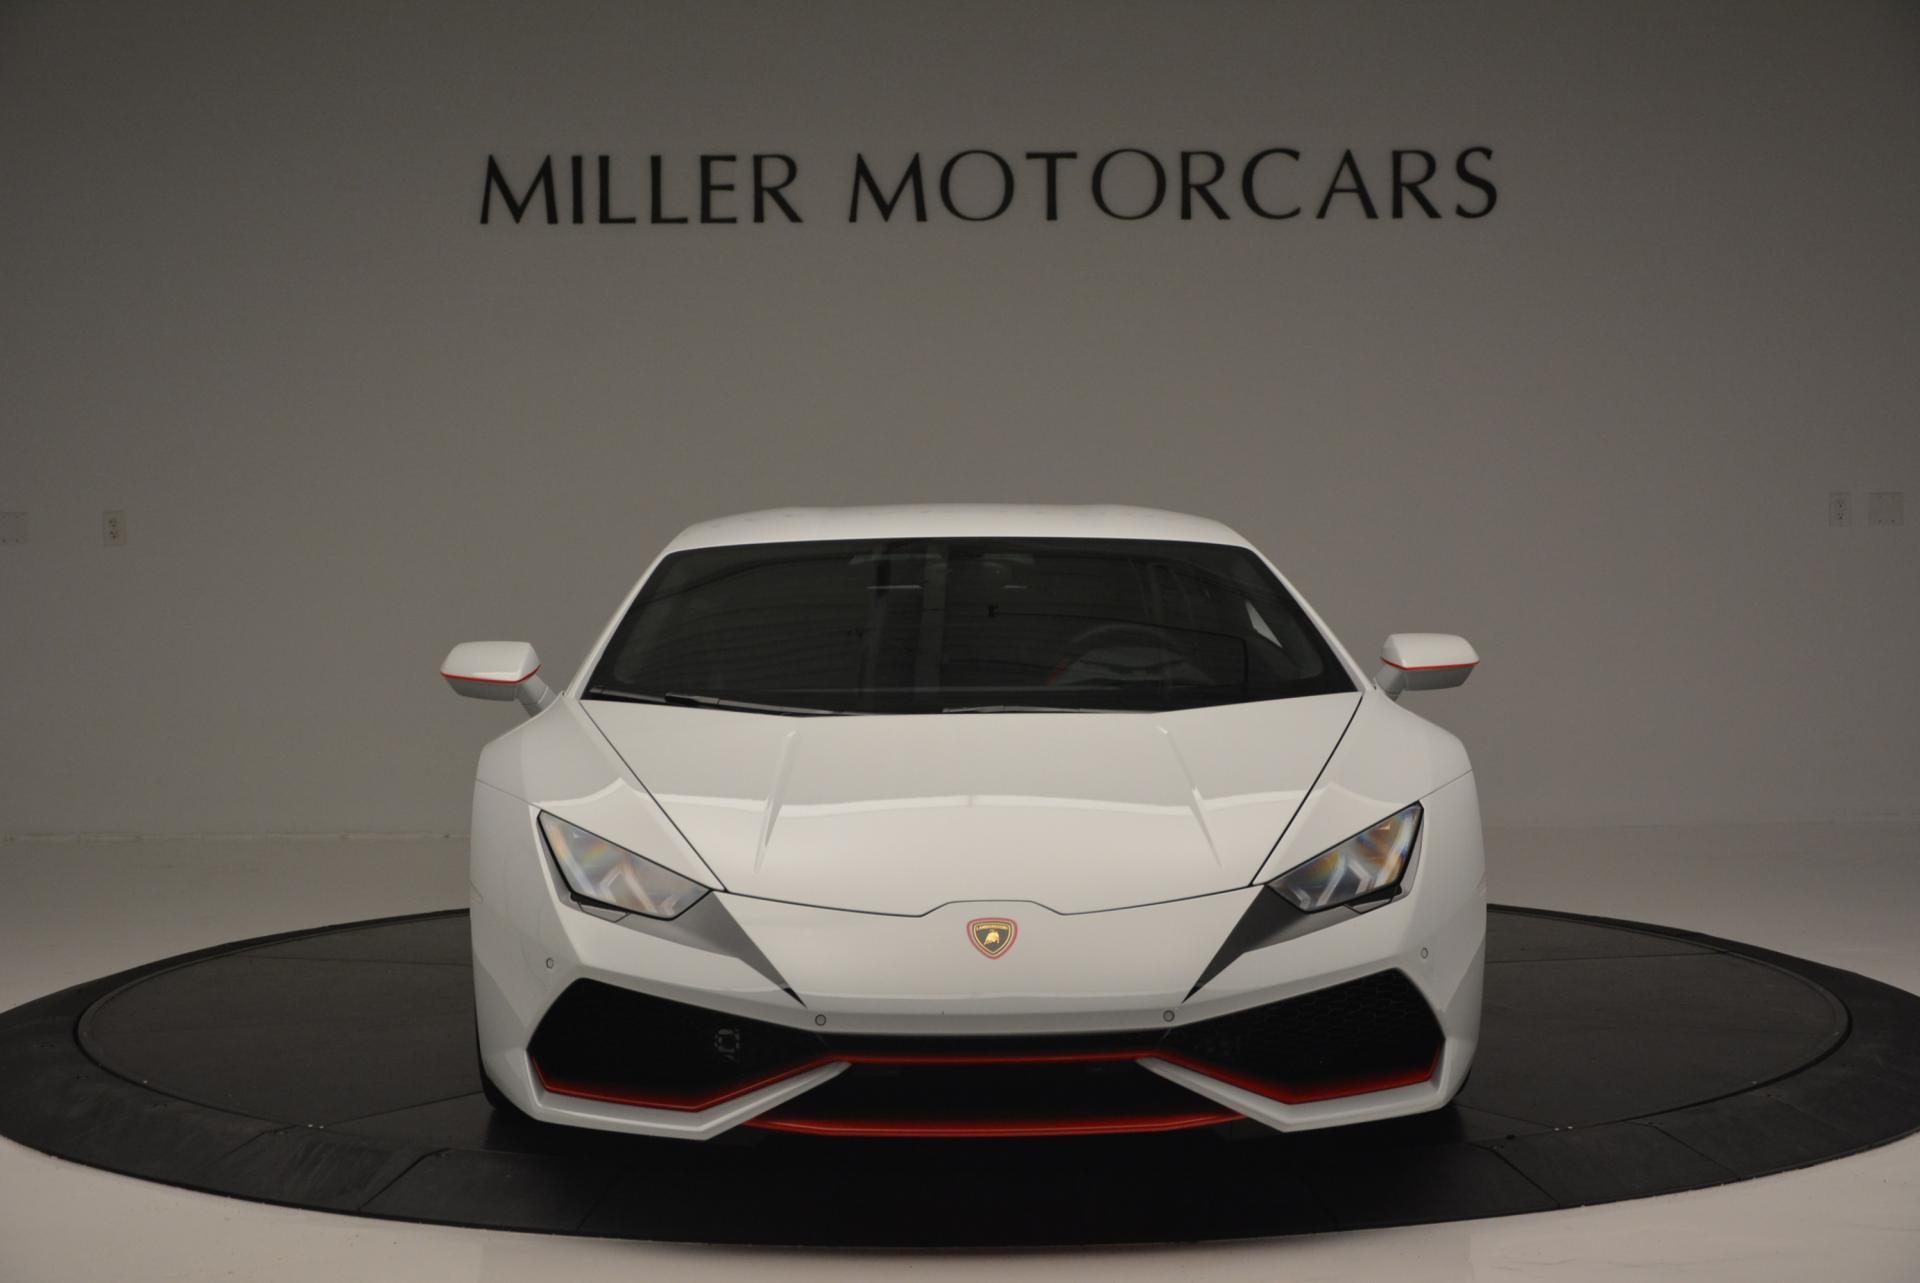 Used 2015 Lamborghini Huracan LP610-4 For Sale In Greenwich, CT. Alfa Romeo of Greenwich, F1707A 114_p8